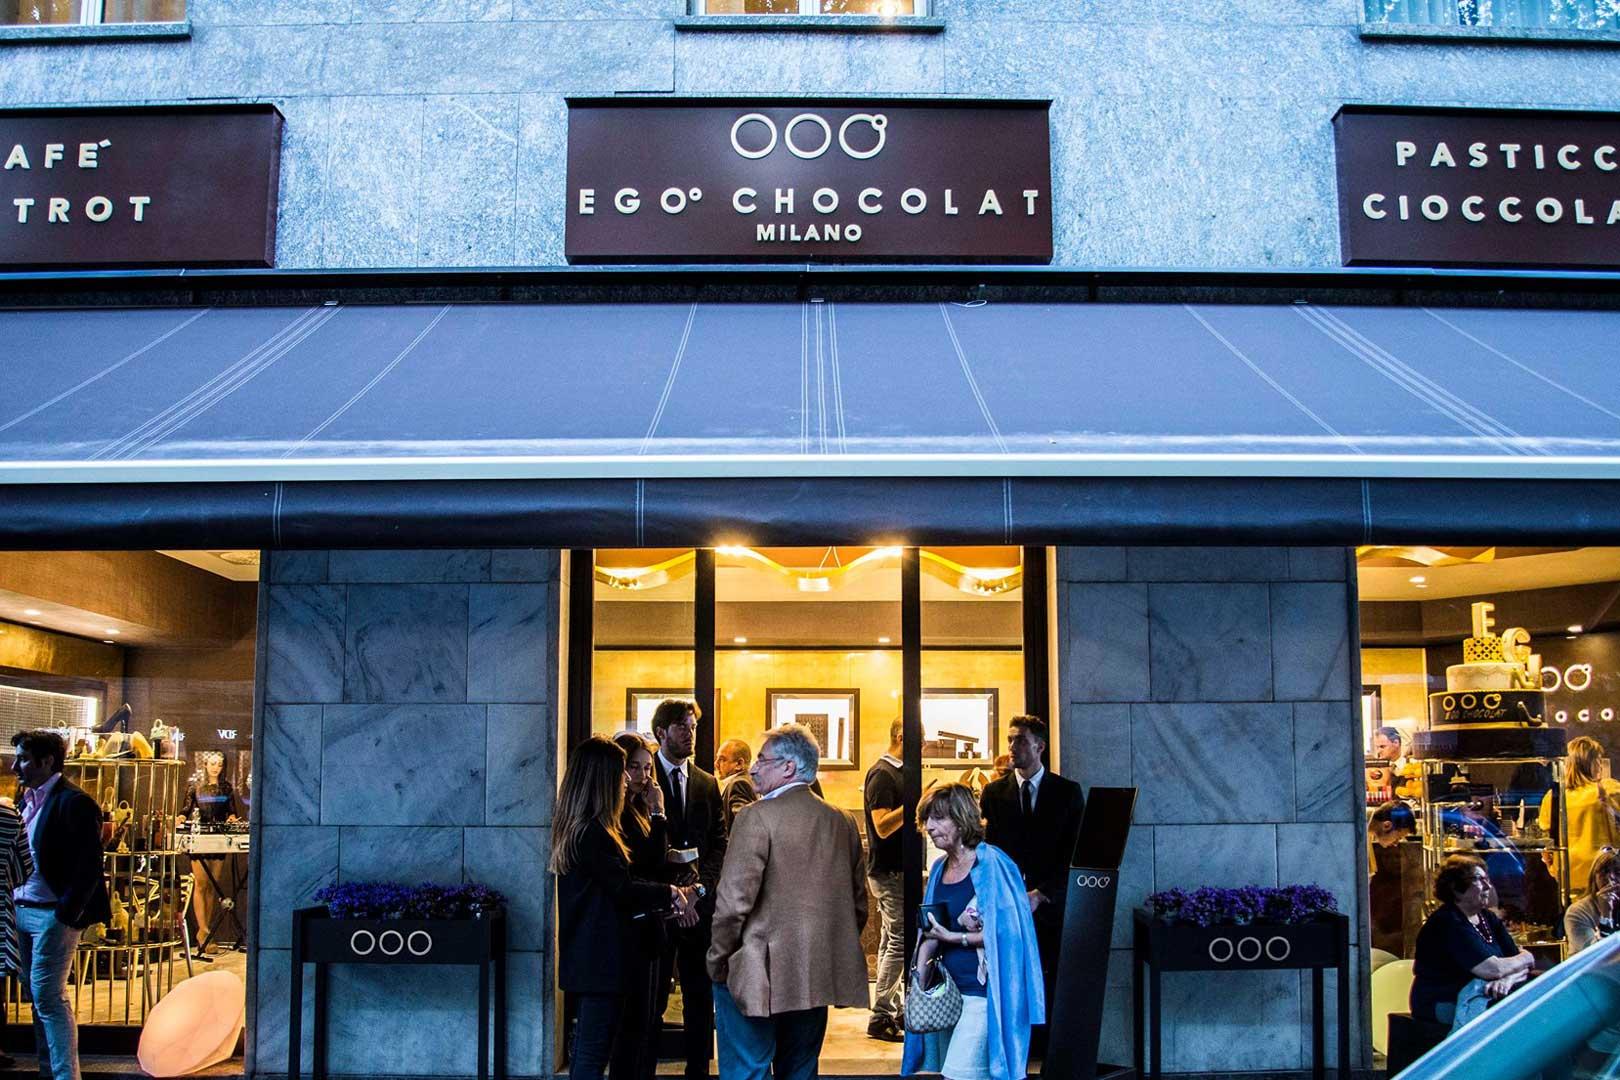 ego-chocolat-esterno